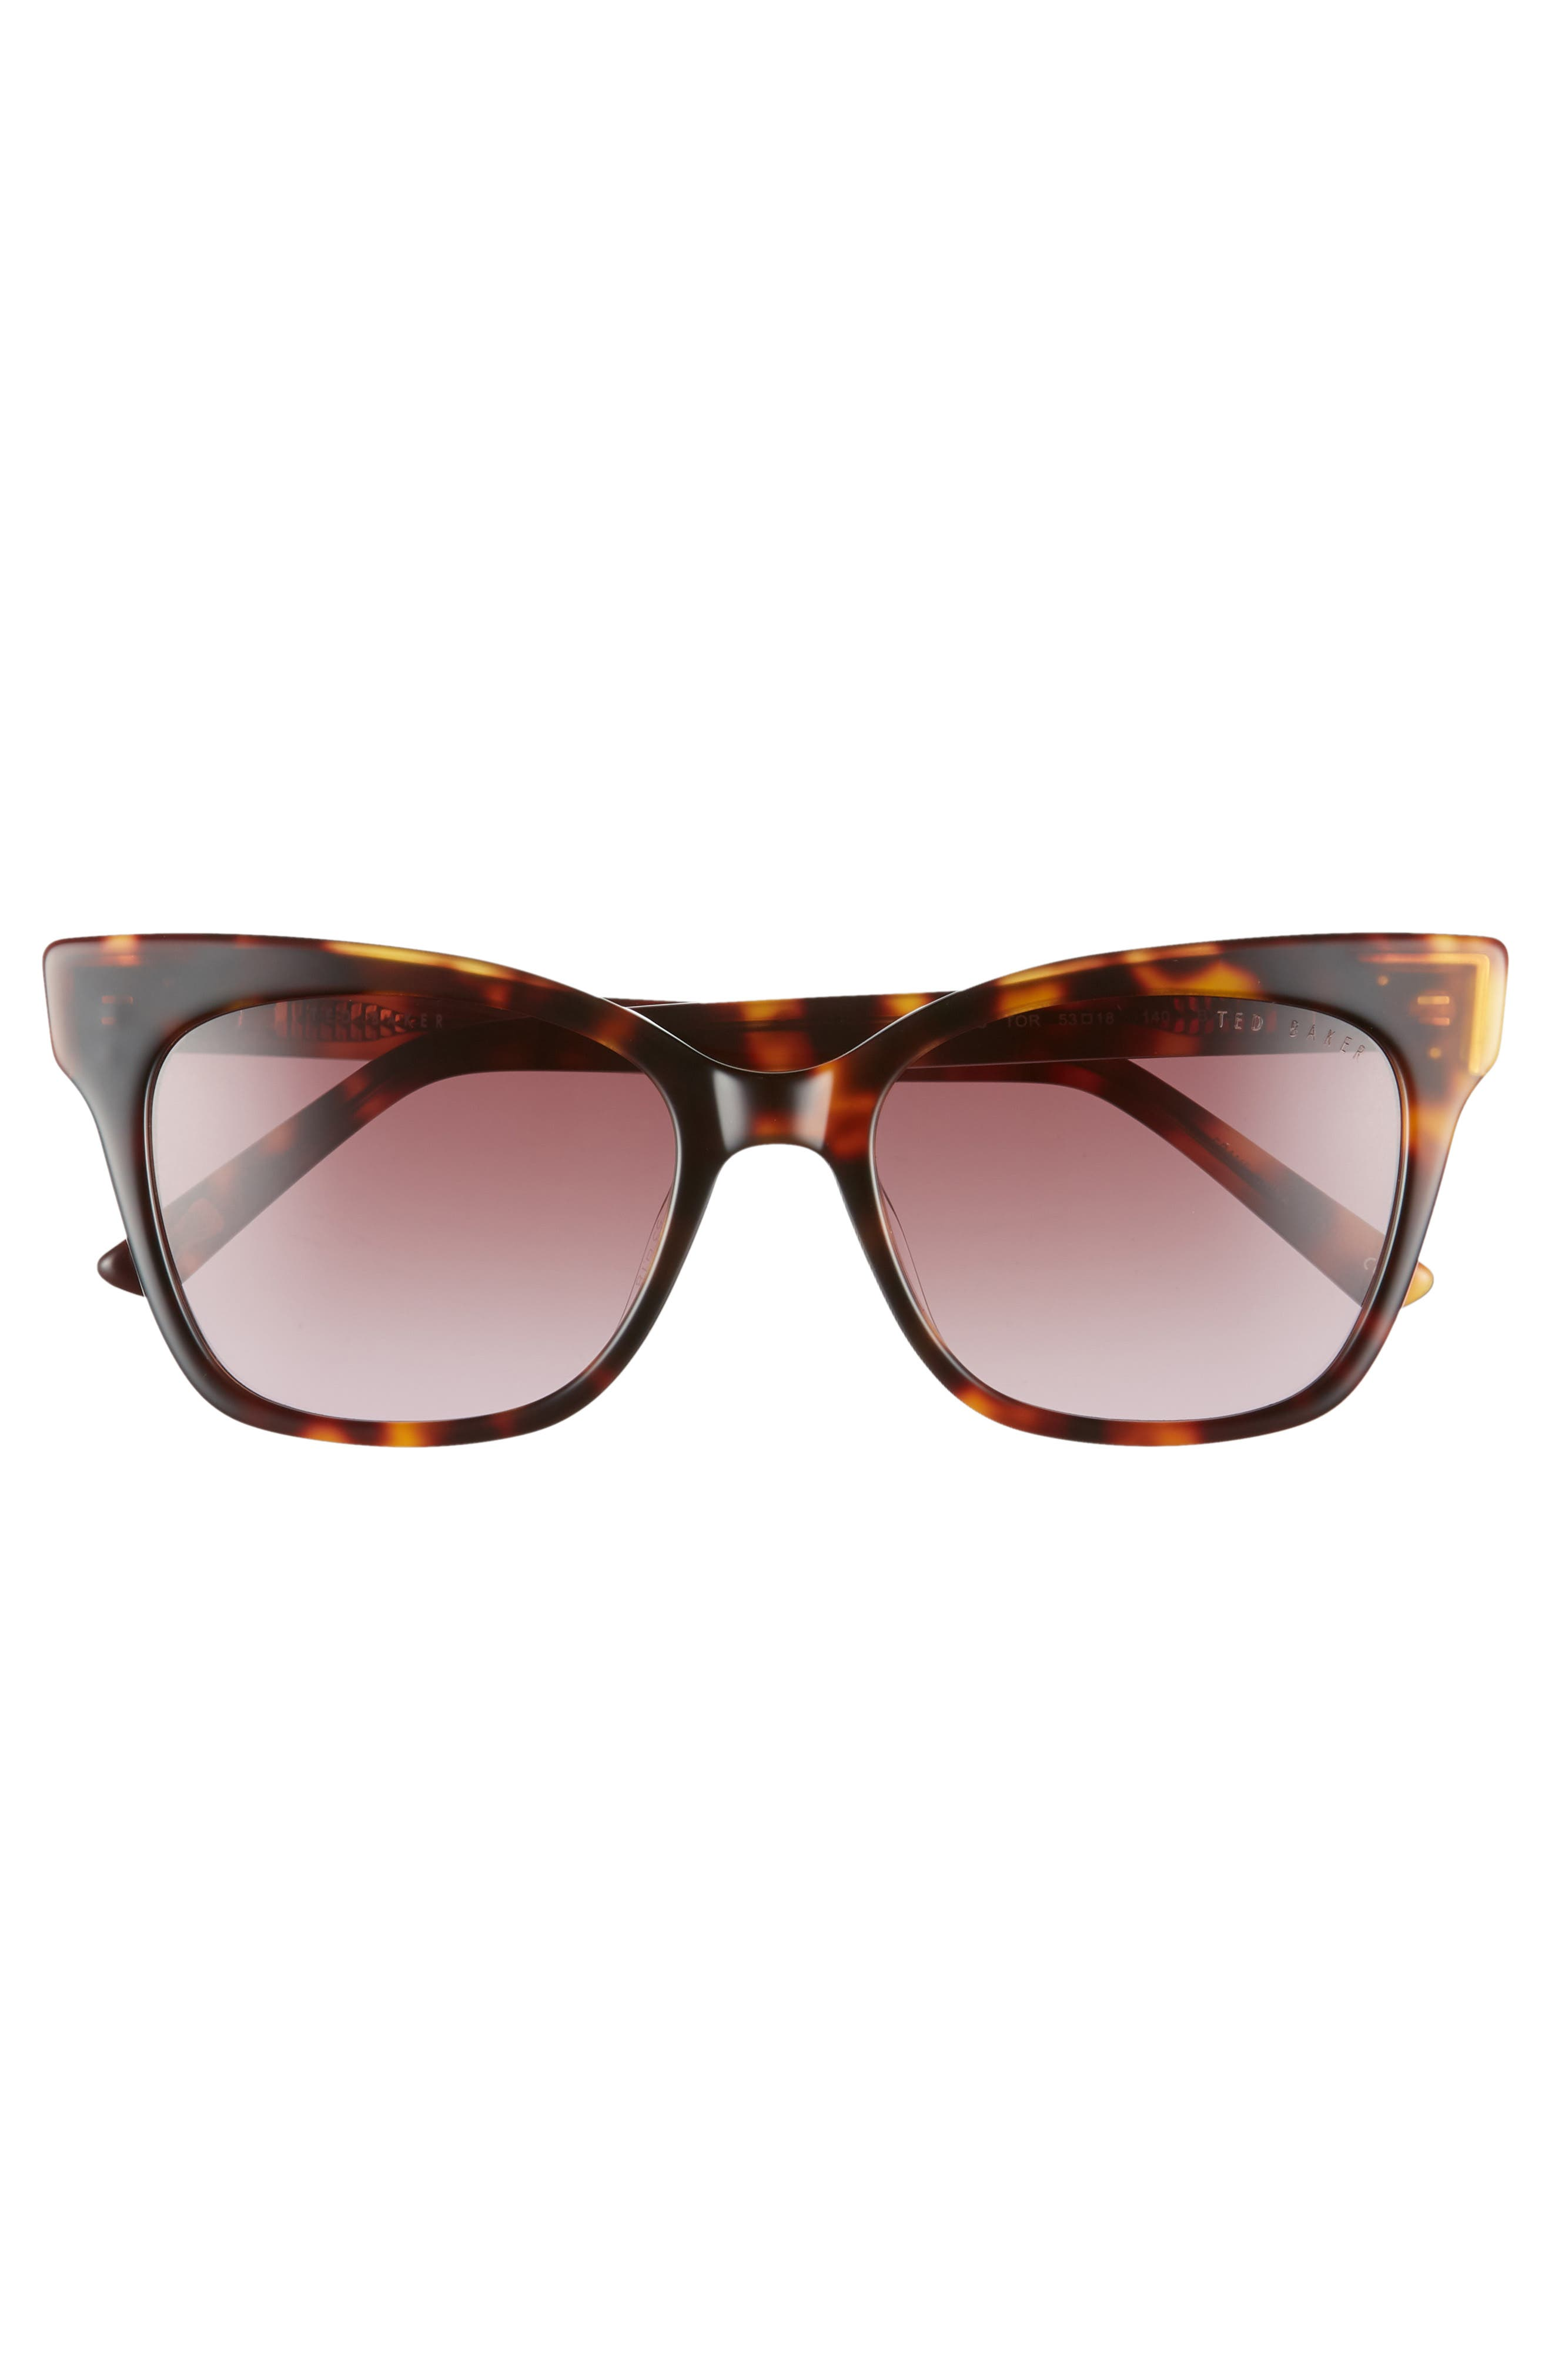 53mm Square Cat Eye Sunglasses,                             Alternate thumbnail 3, color,                             TORTOISE